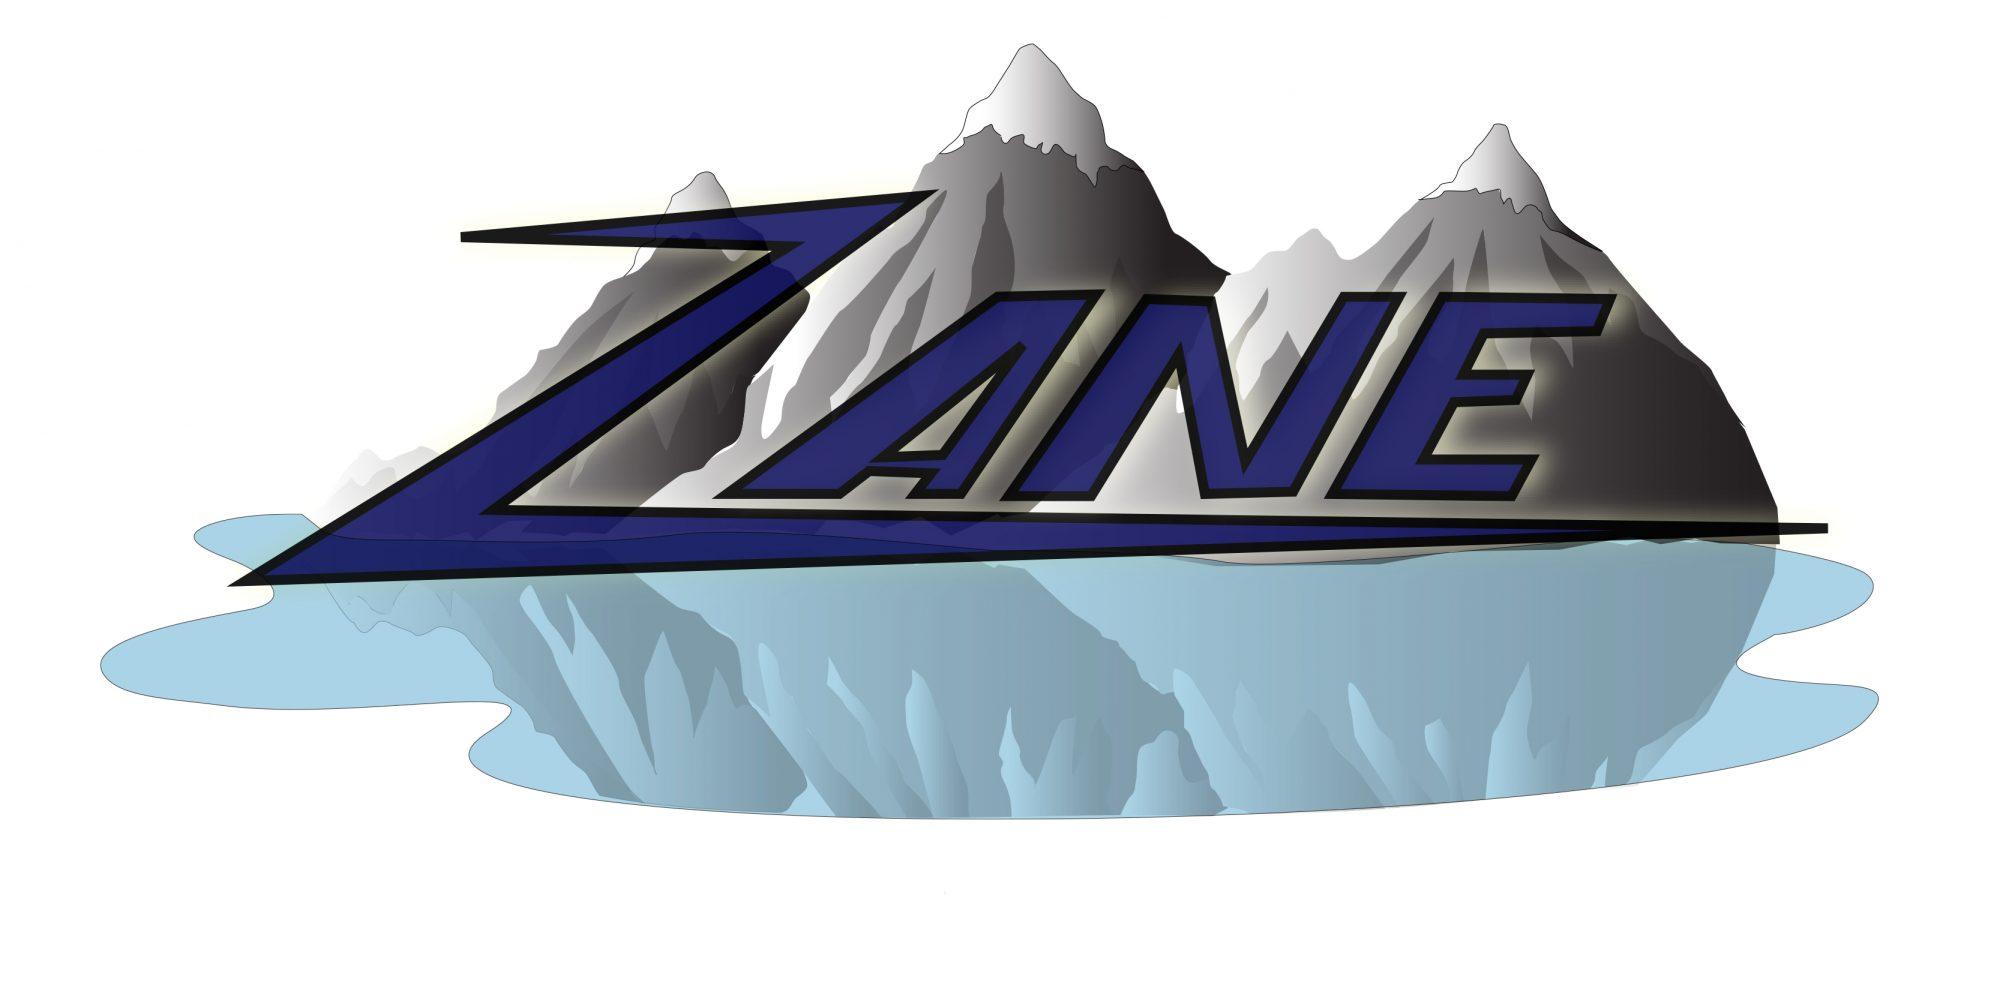 Zane & Associates